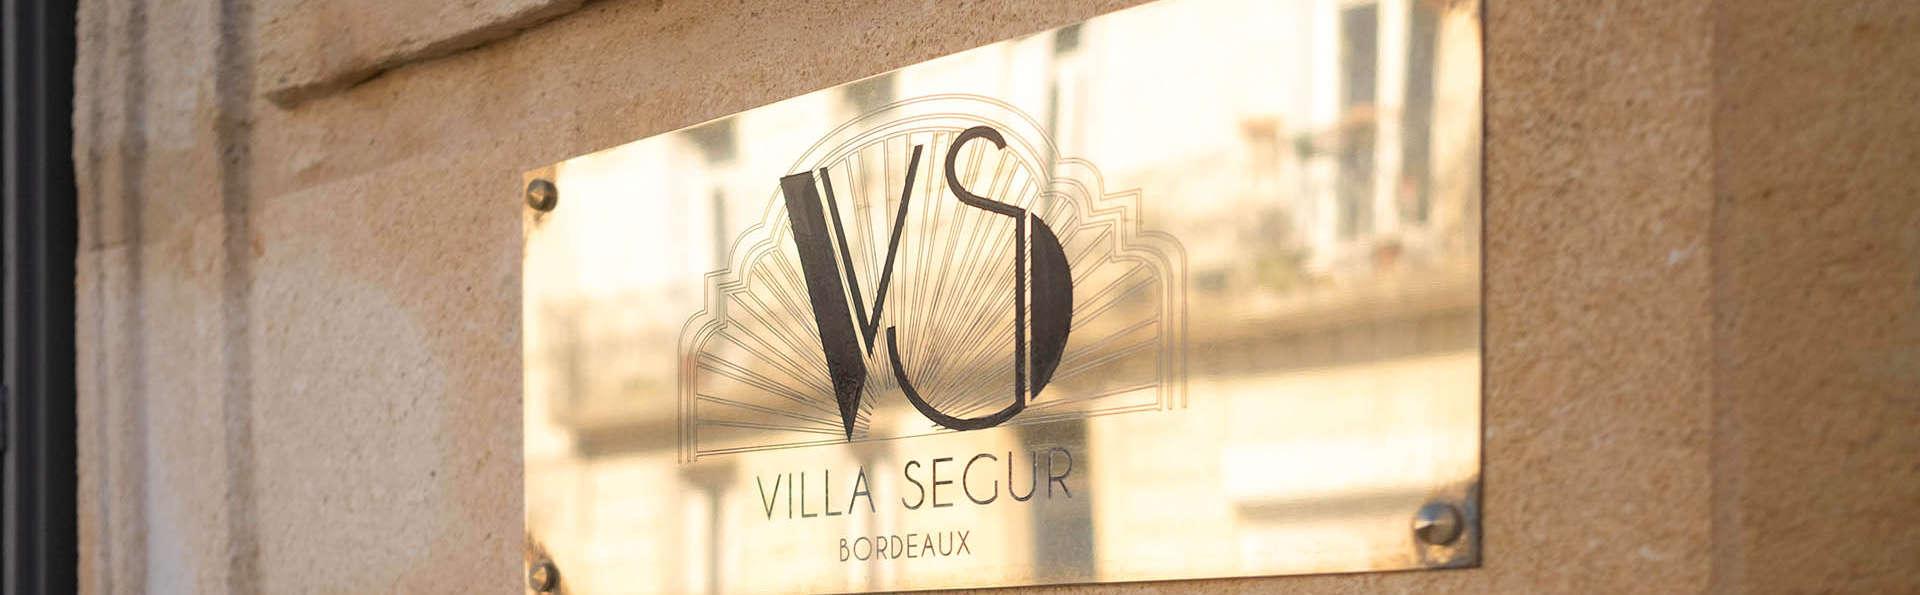 Villa Segur Bordeaux - EDIT_Signage_01.jpg